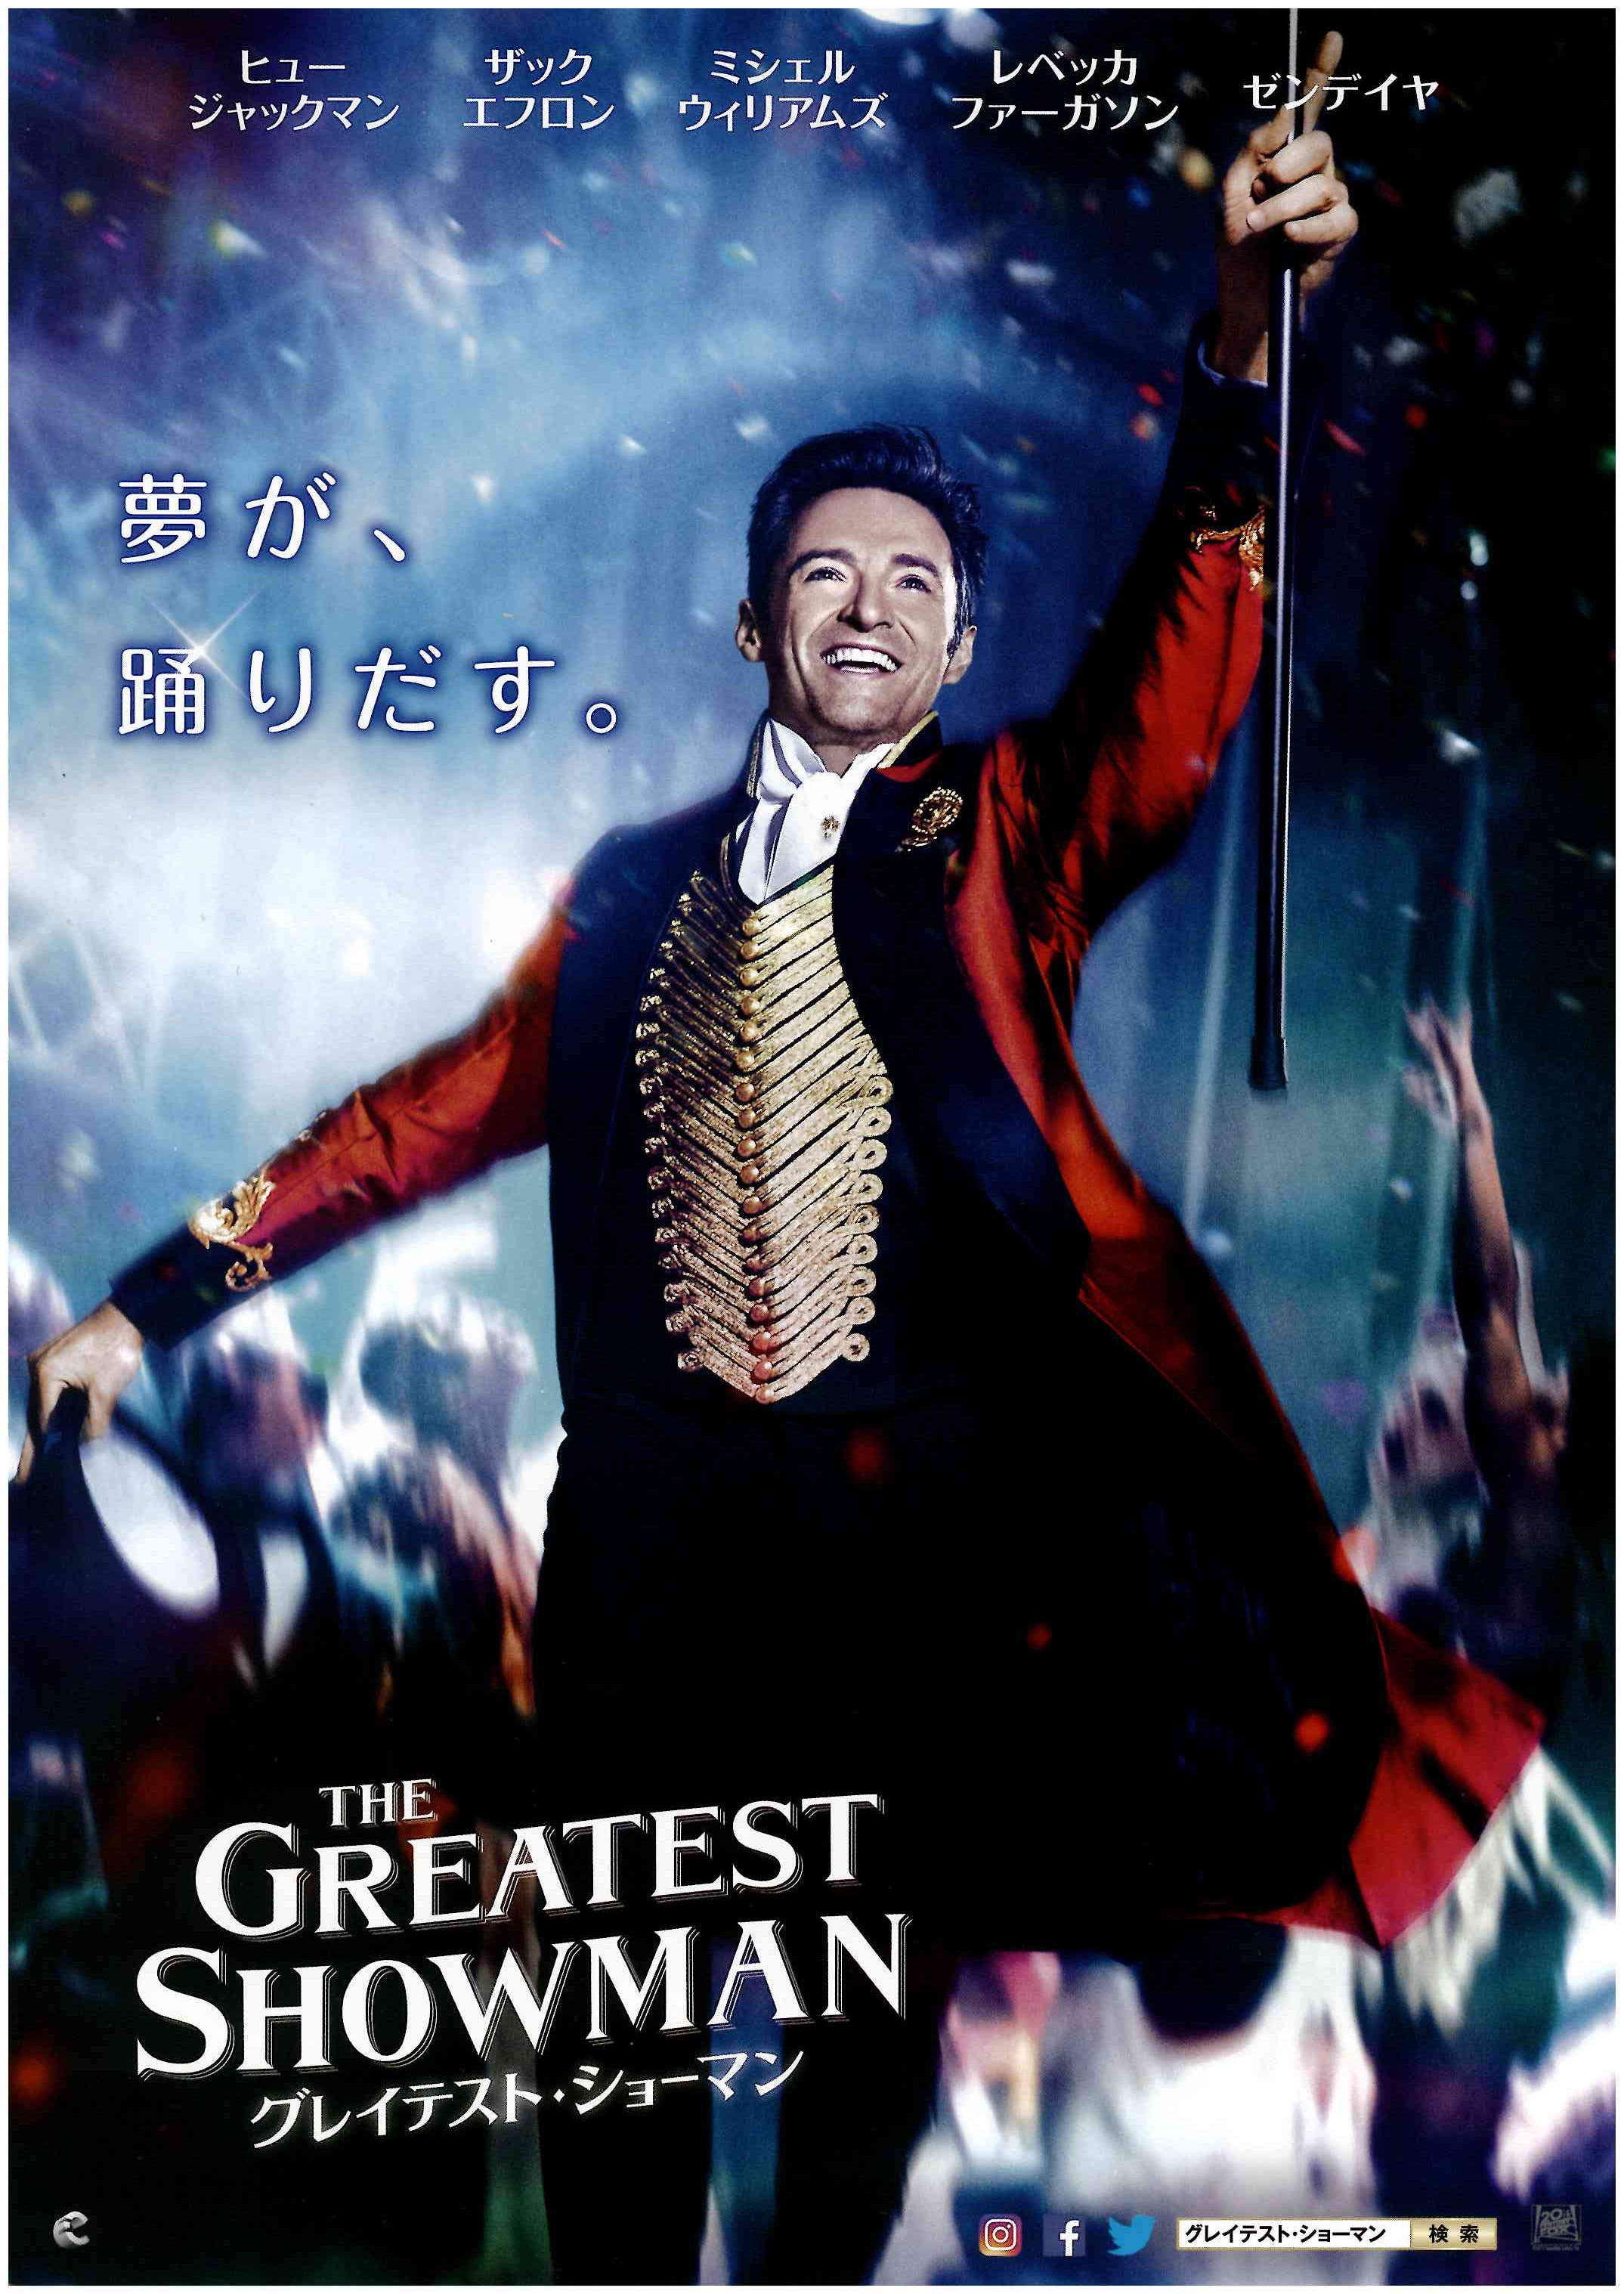 http://www.zushi-kaisei.ac.jp/news/e7470c622ee2beda37e4525cbac43835e132cd1a.jpg